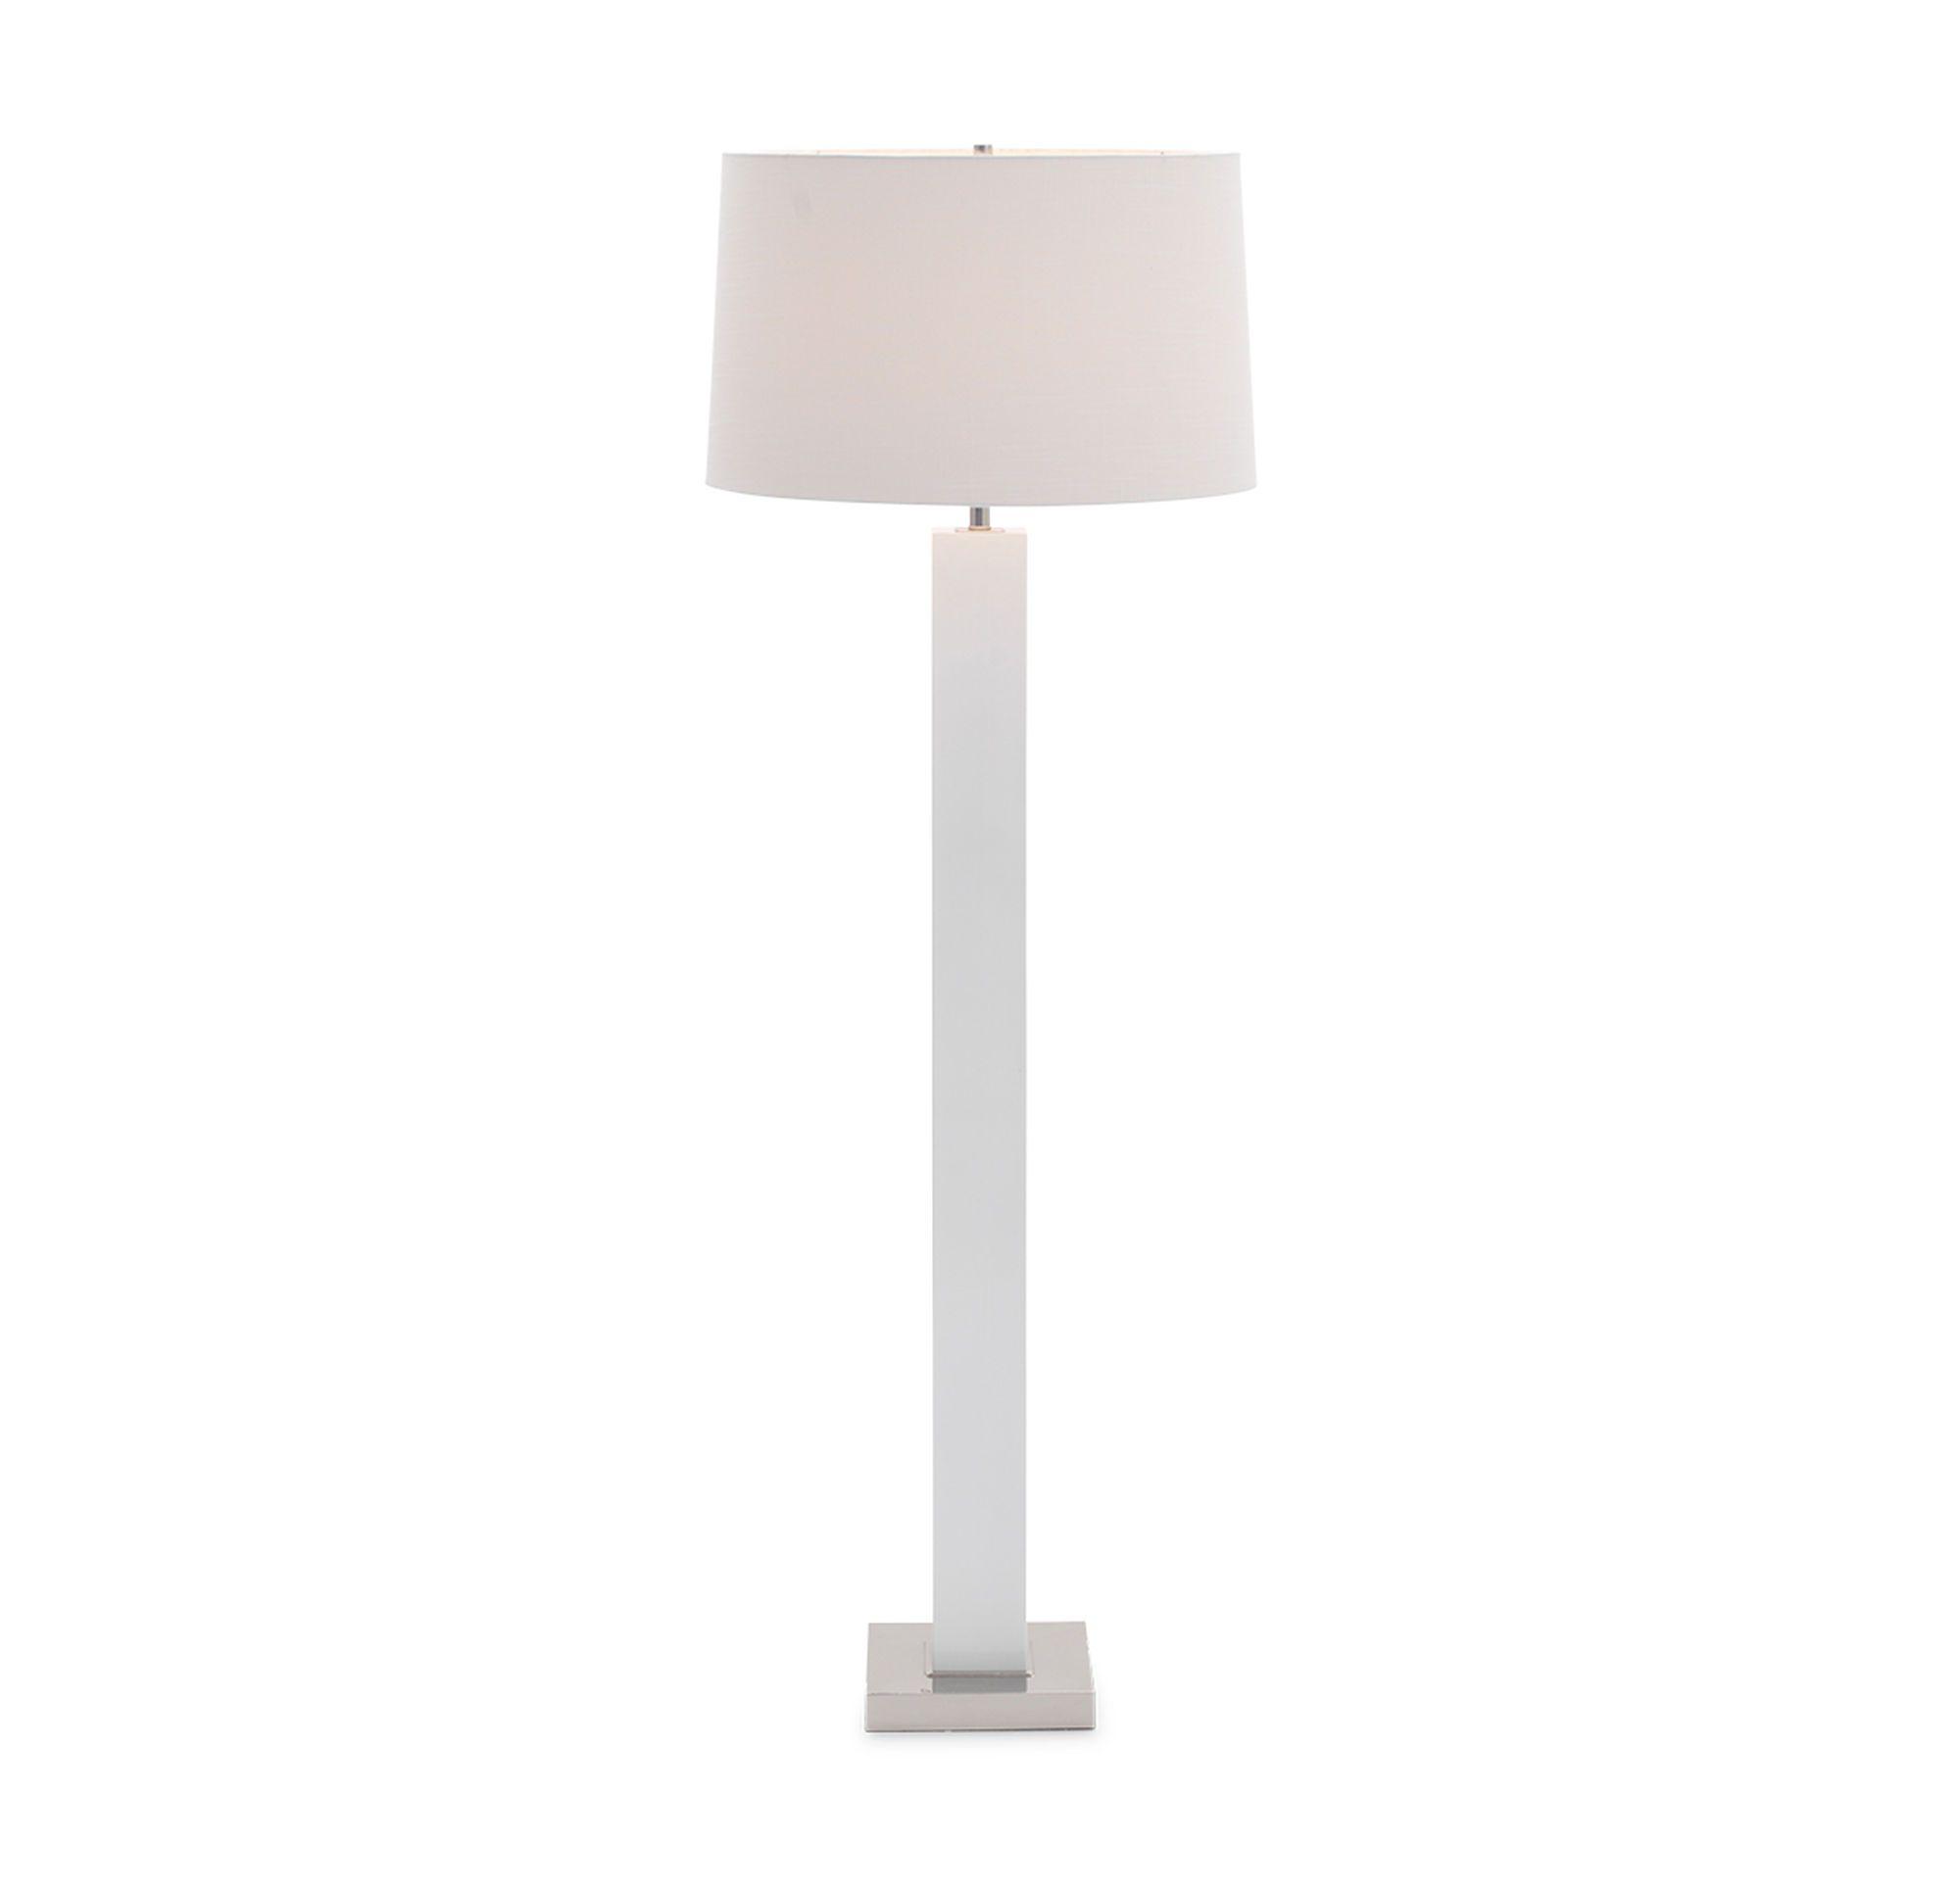 Rubix Floor Lamp Mitchell Gold Bob Williams Floor Lamp Styles Floor Lamp Contemporary Floor Lamps